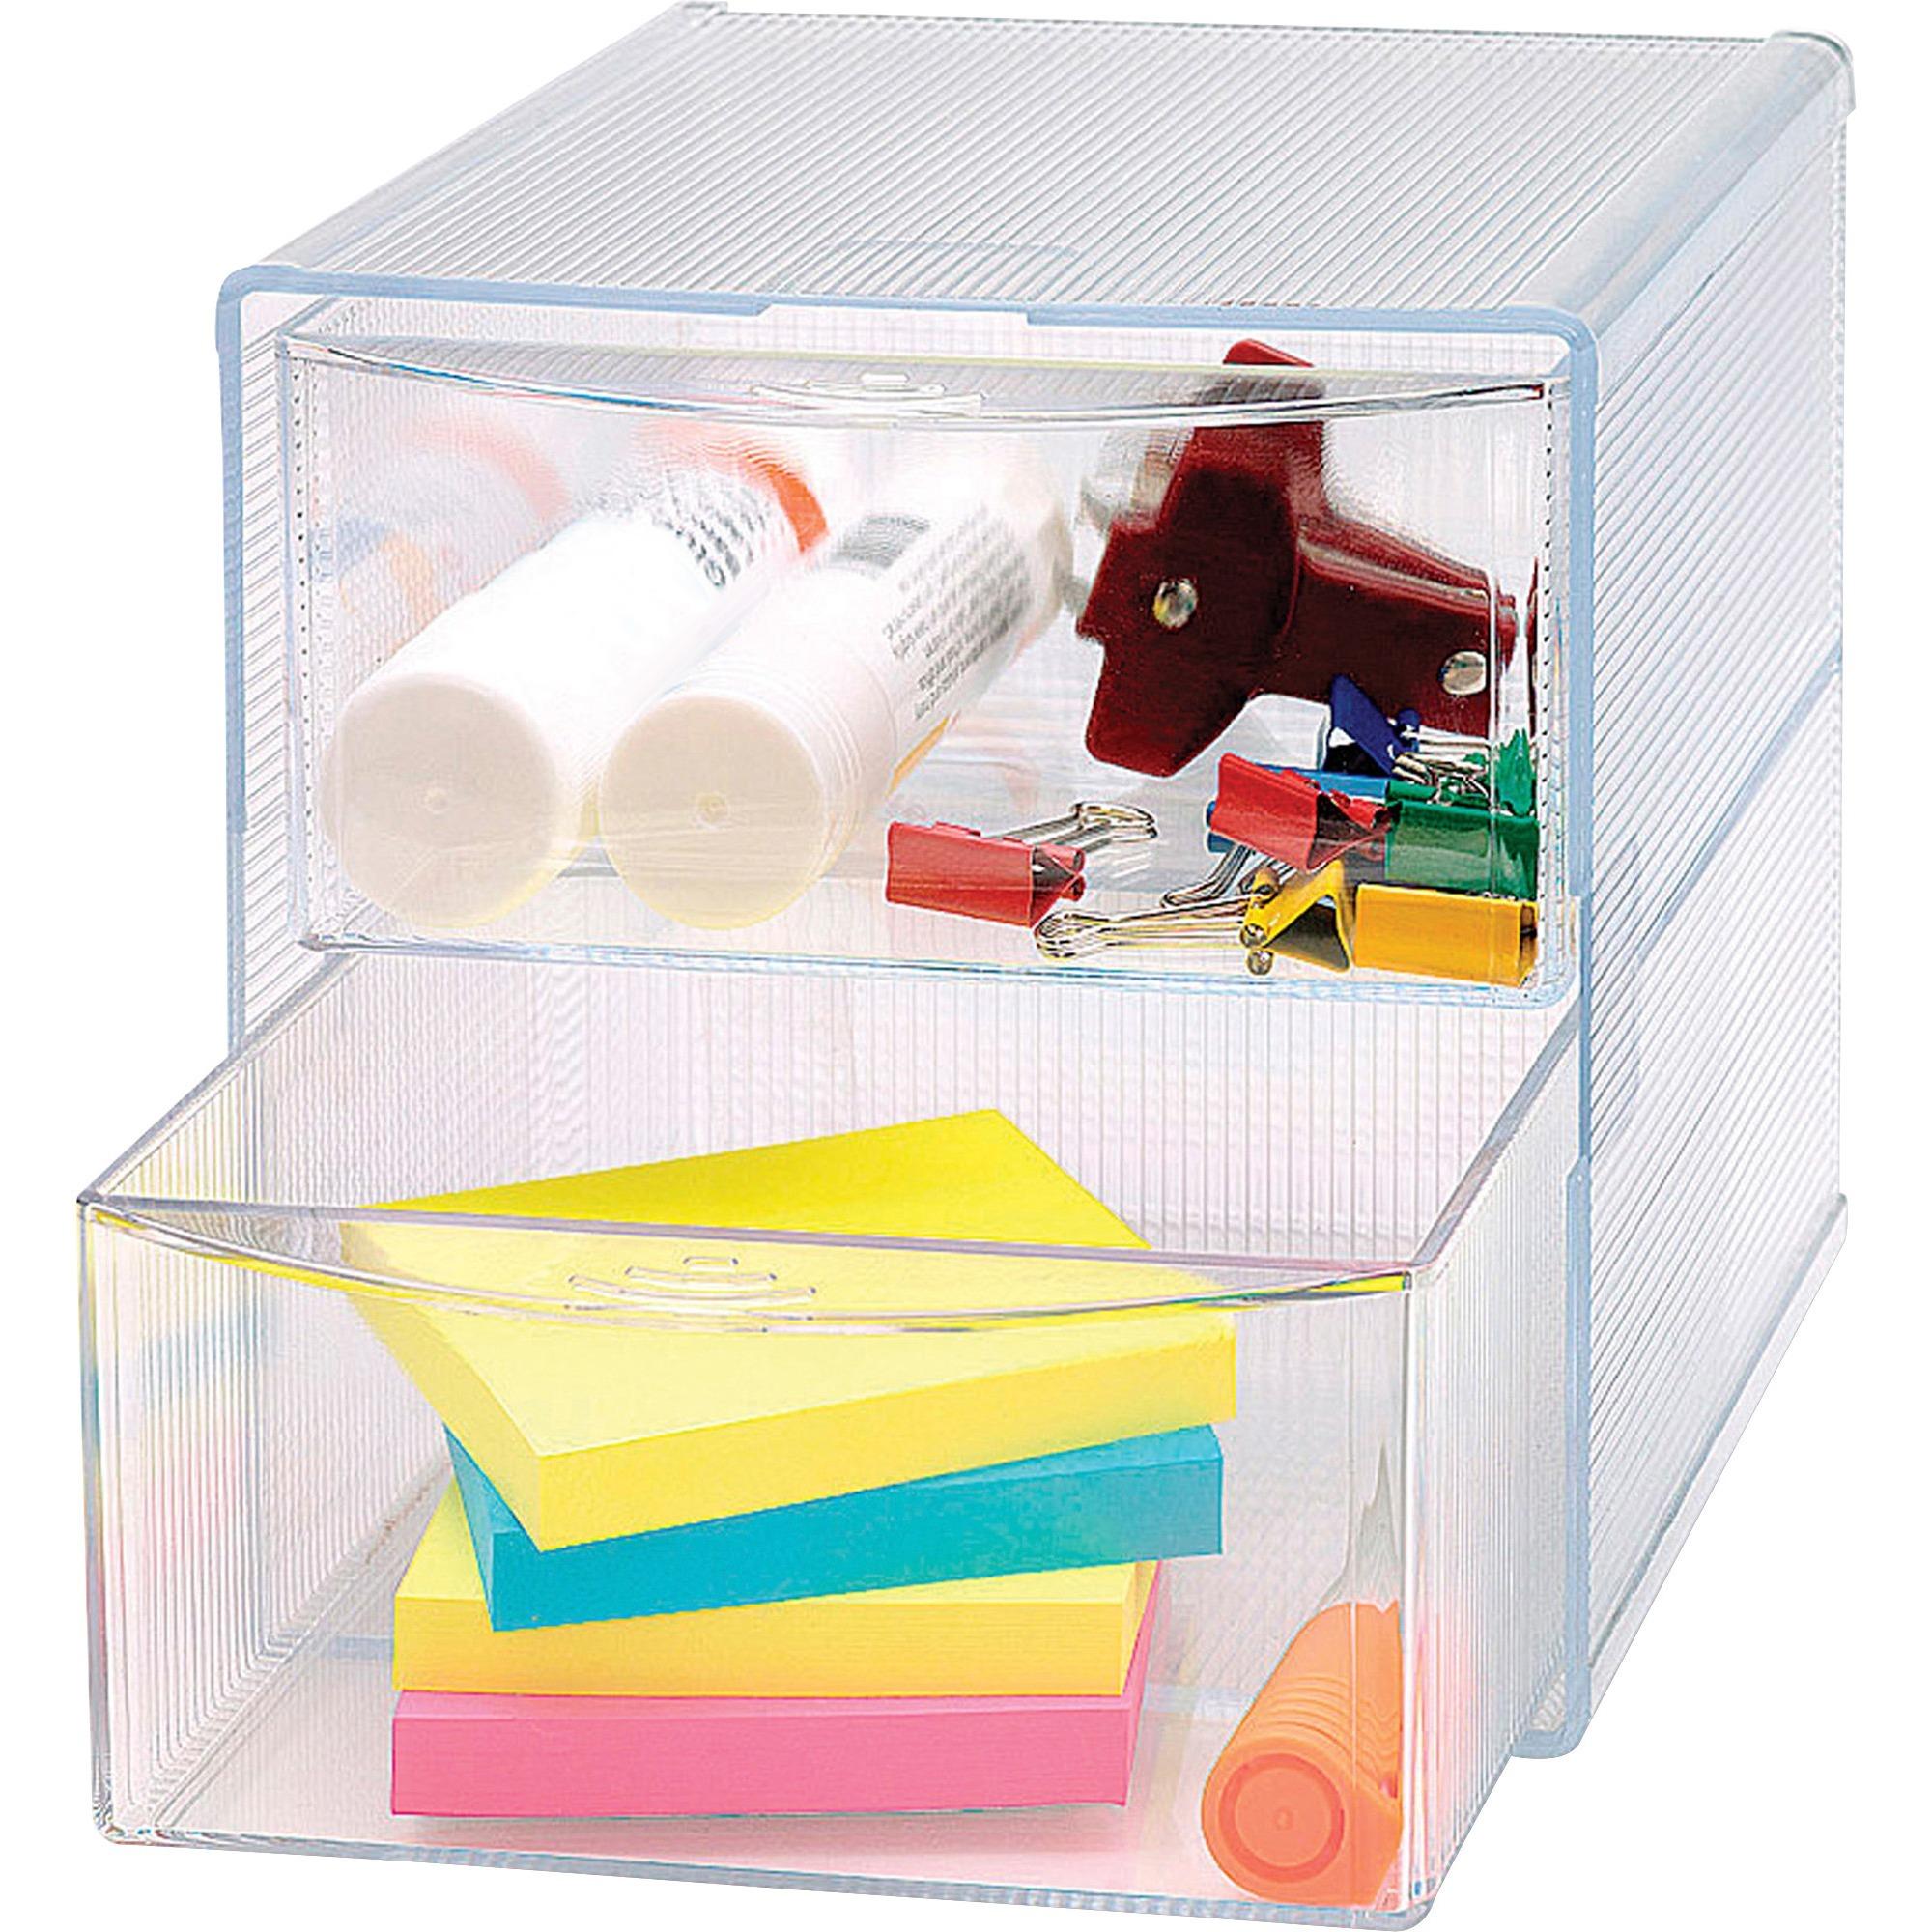 drawers lot set rolling organizer cart bin images l container storage detail drawer